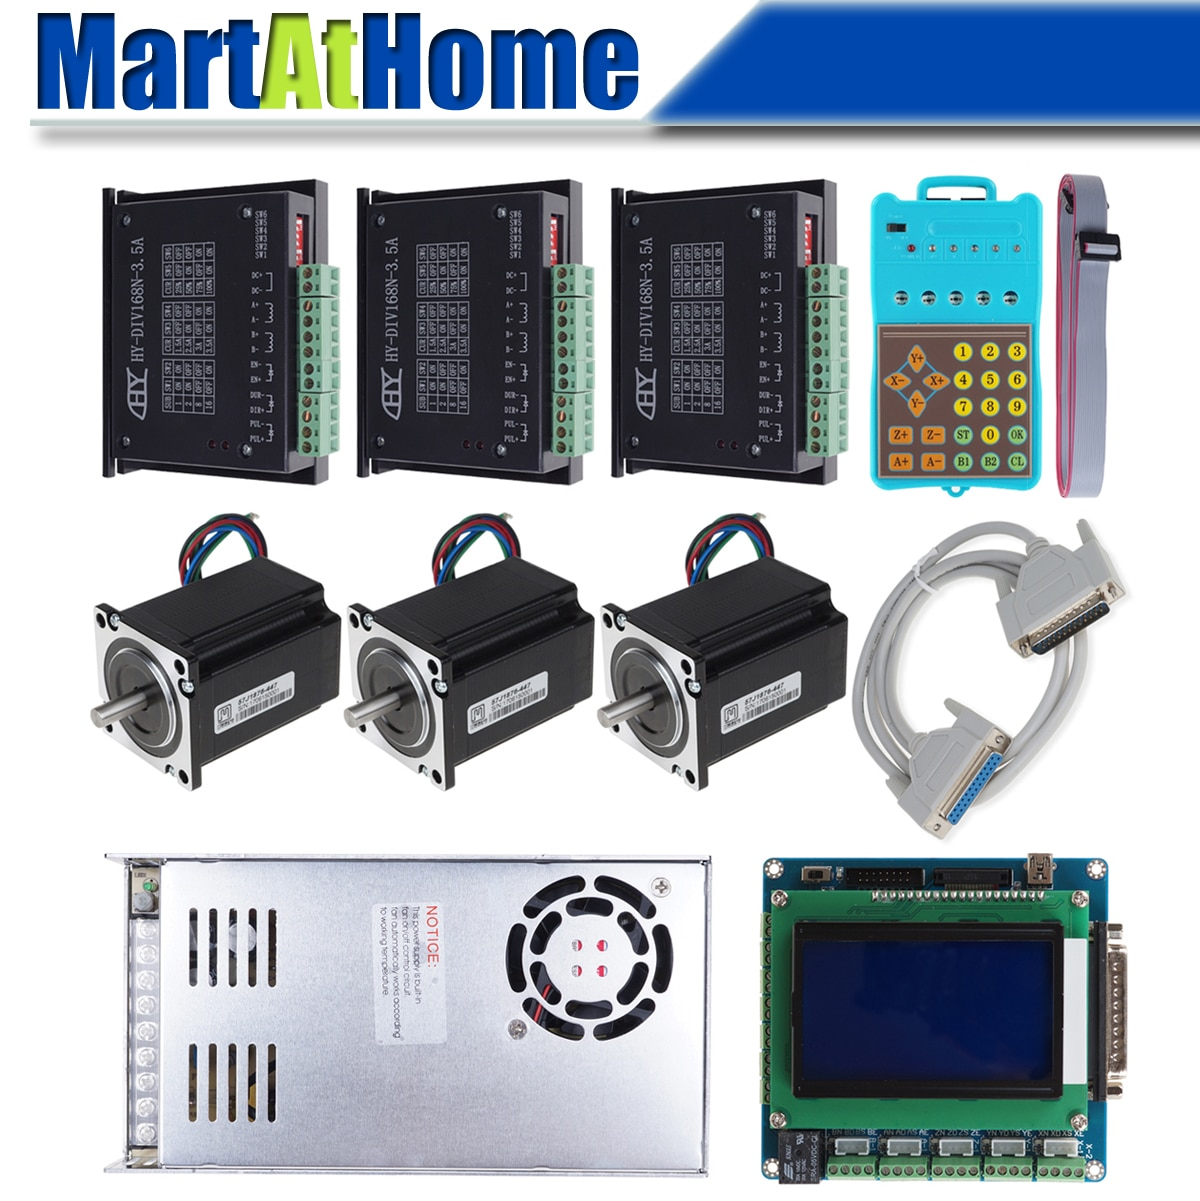 Kit de controlador de Motor paso a paso DMBCP003 CNC 3 ejes/4 ejes 3.5A con soporte de controlador MPG Mach3, LinuxCNC, KCAM4 para enrutador CNC DIY